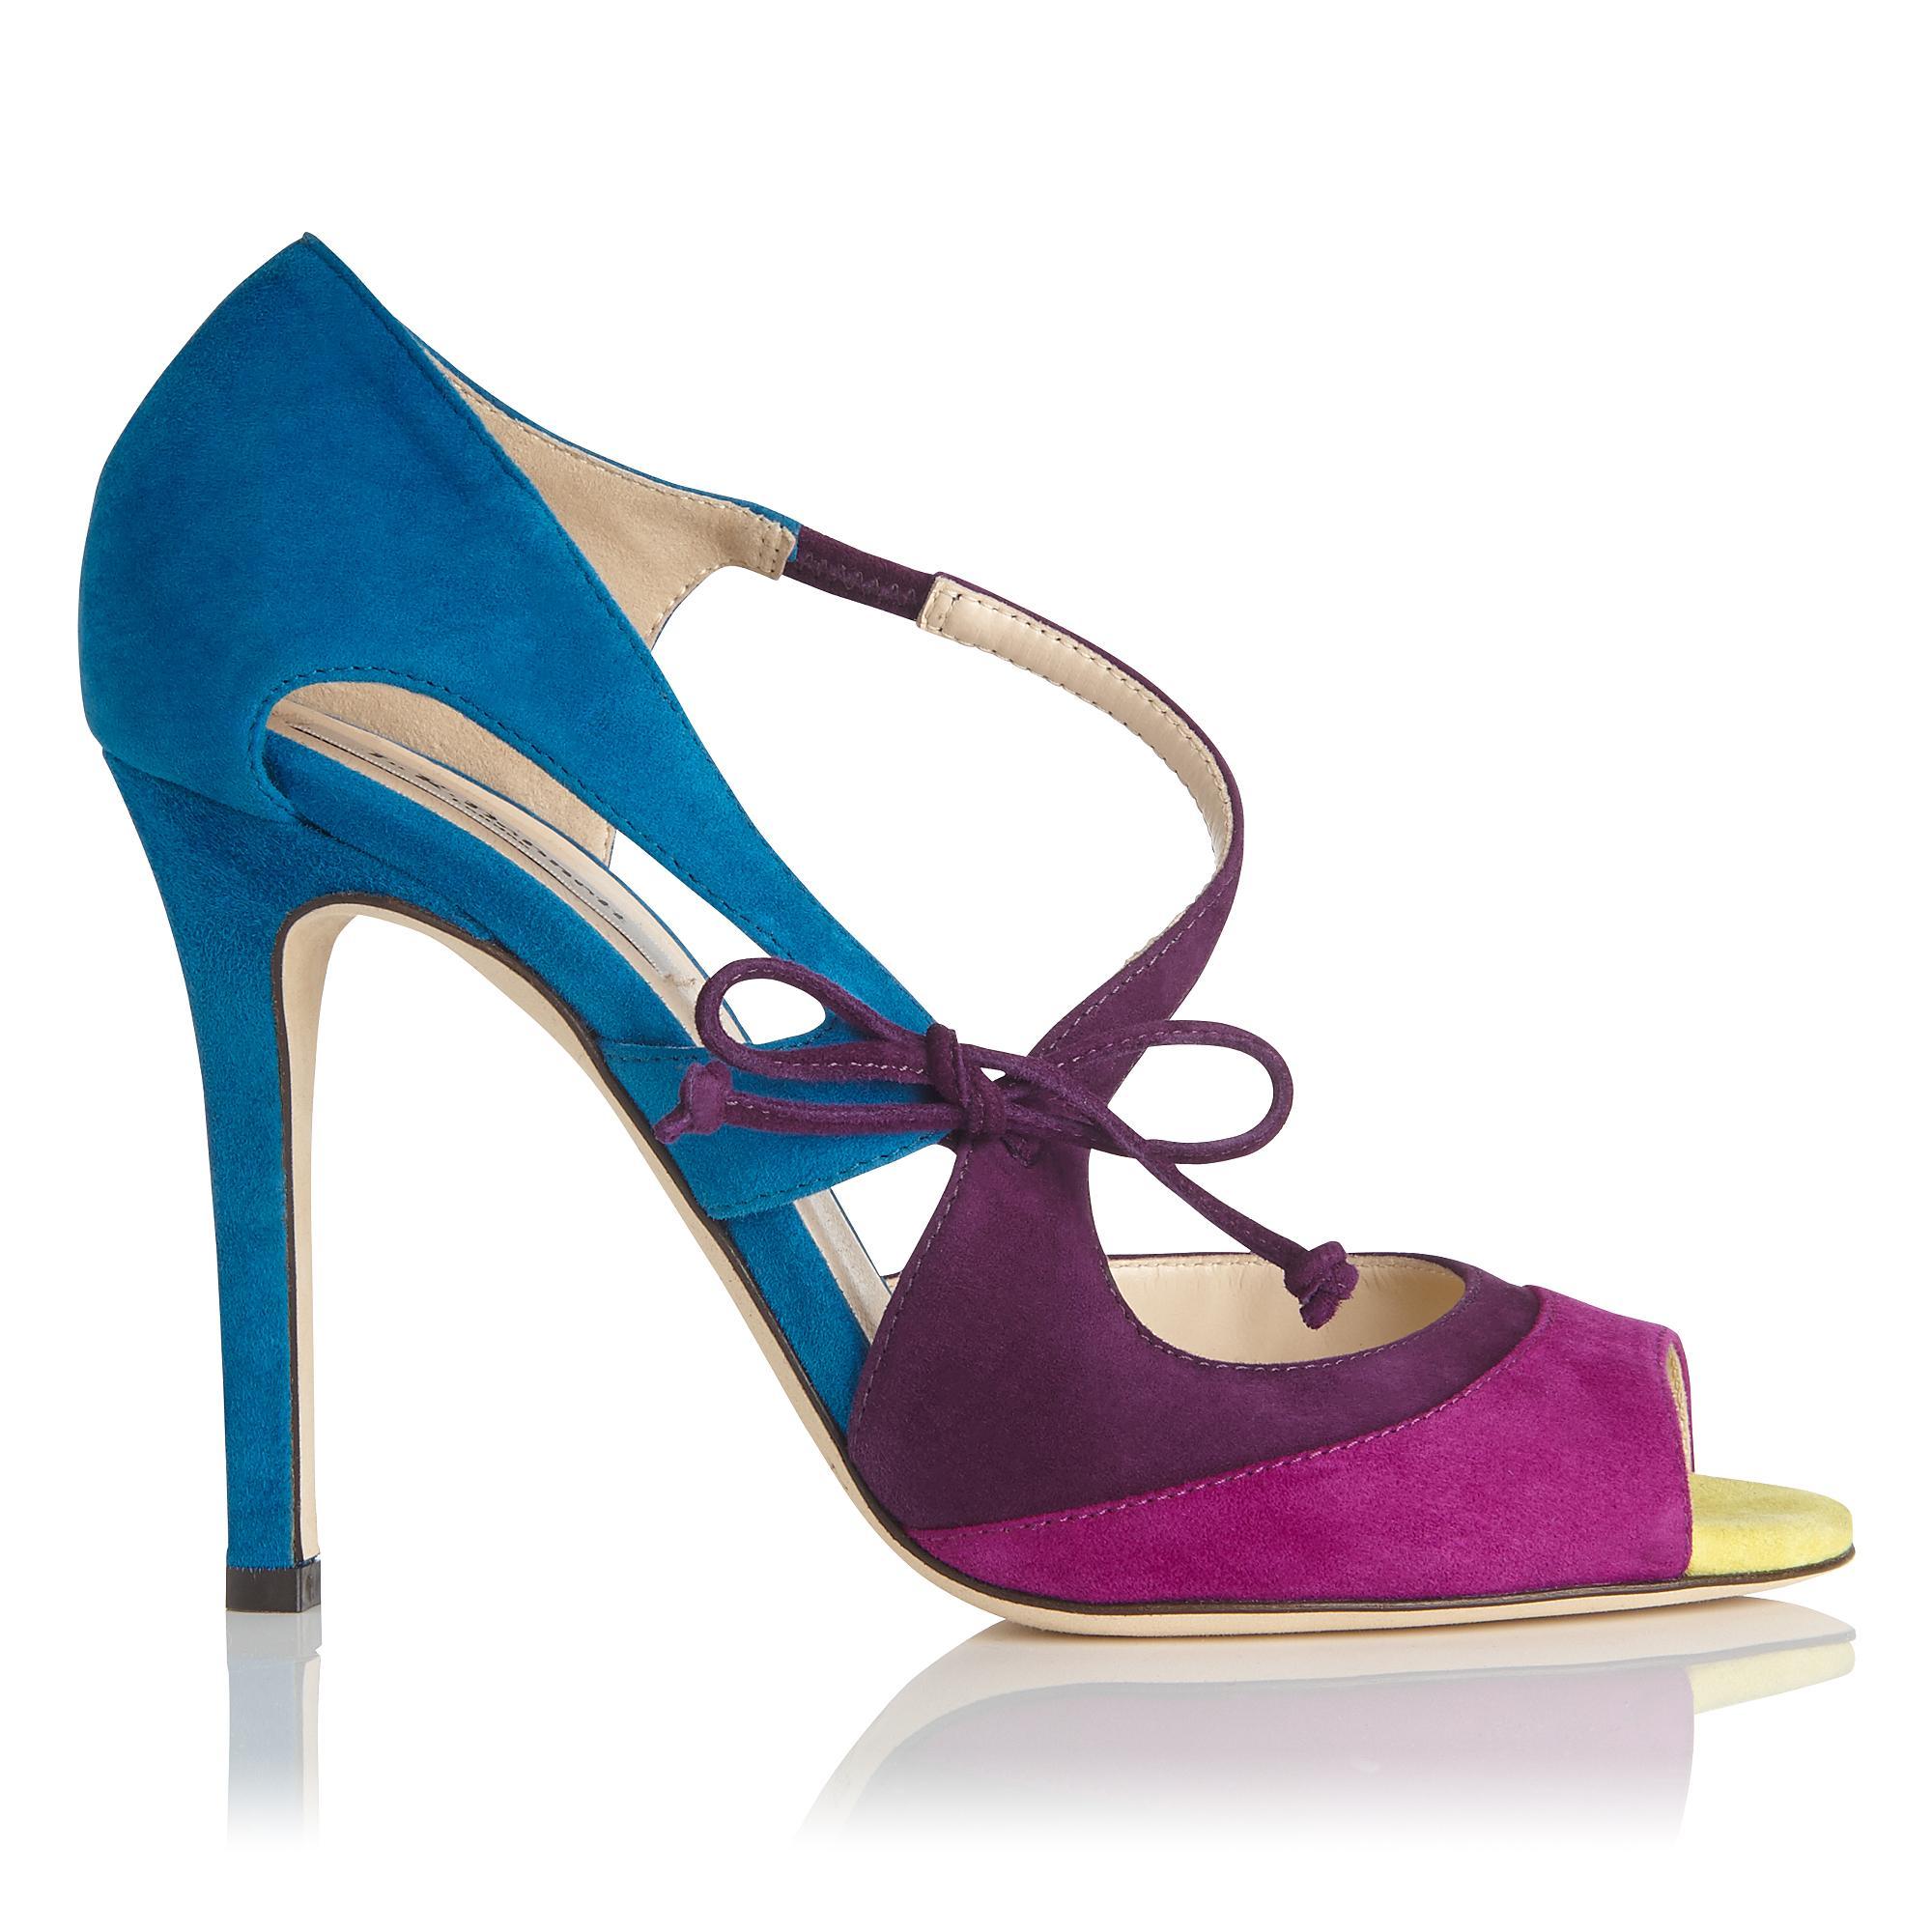 Lucile Multi Color Suede Sandal